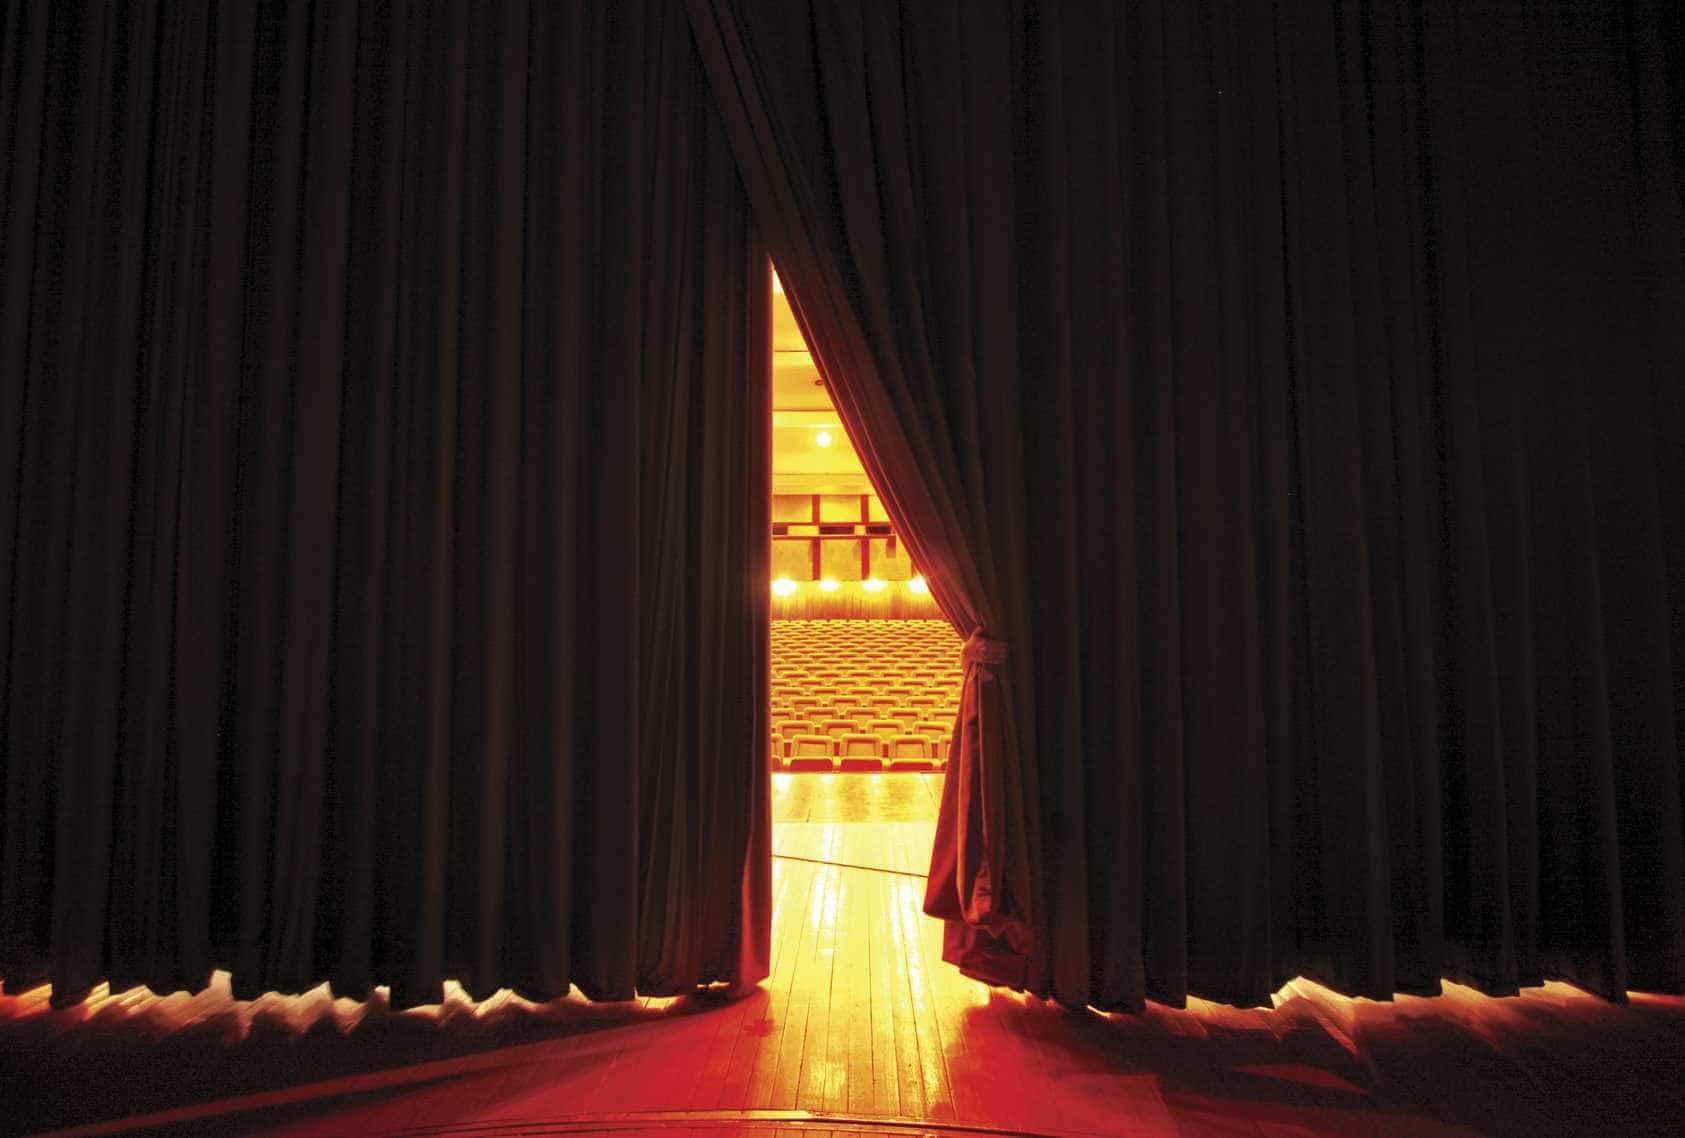 Festival de teatro leva 13 espetáculos a nove palcos de Pombal